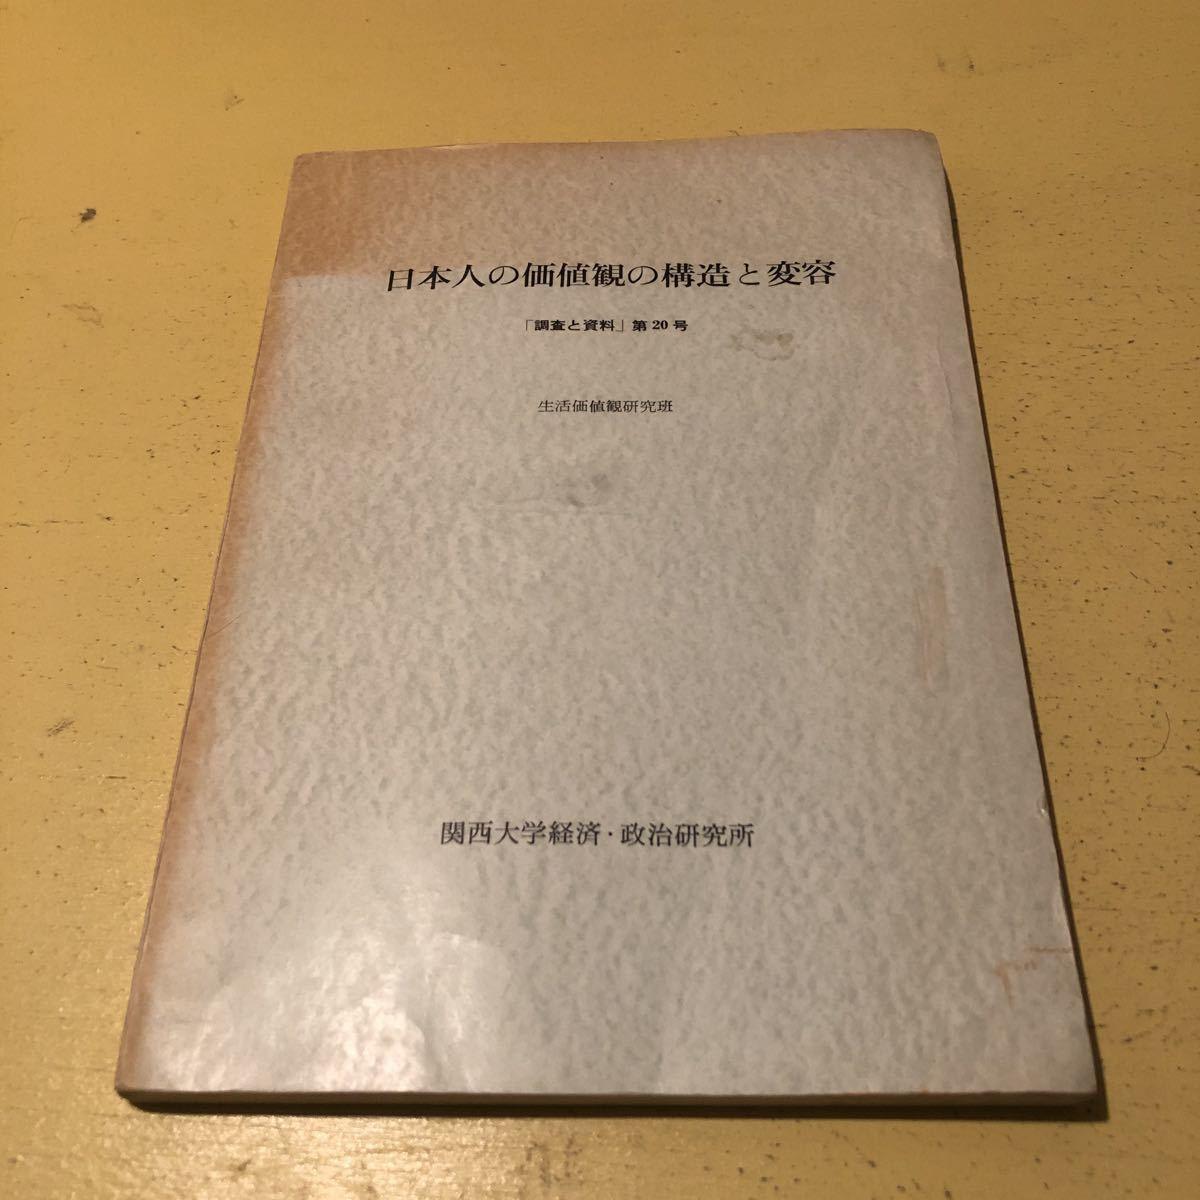 2001☆か20☆ 日本人の価値観の構造と変容 調査と資料 第20号 生活価値観研究班 関西大学経済政治研究所 昭和51年発行_画像1